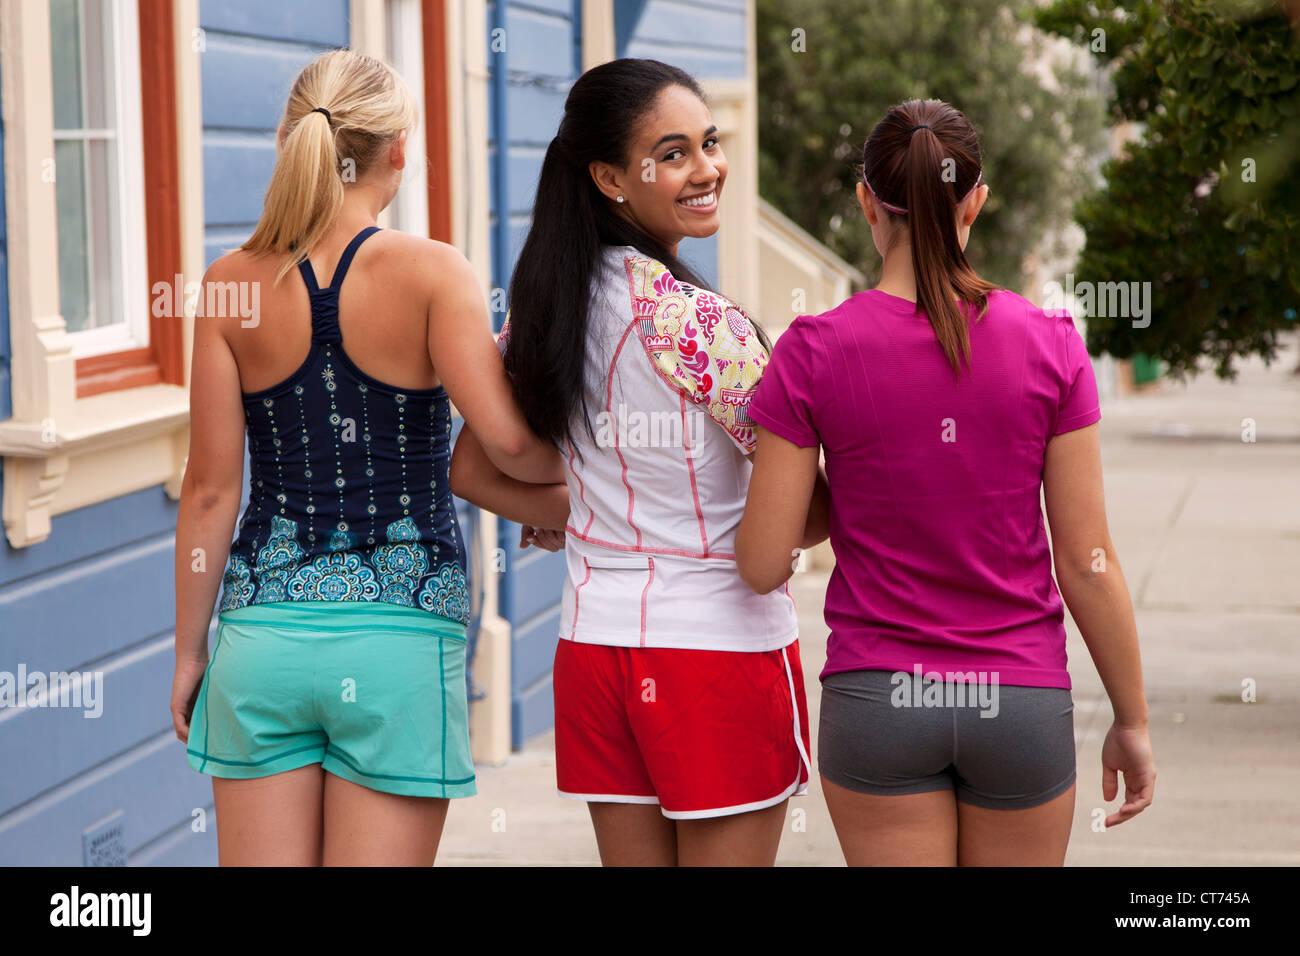 Tres niñas en ropa de gimnasia está caminando por la calle. Imagen De Stock